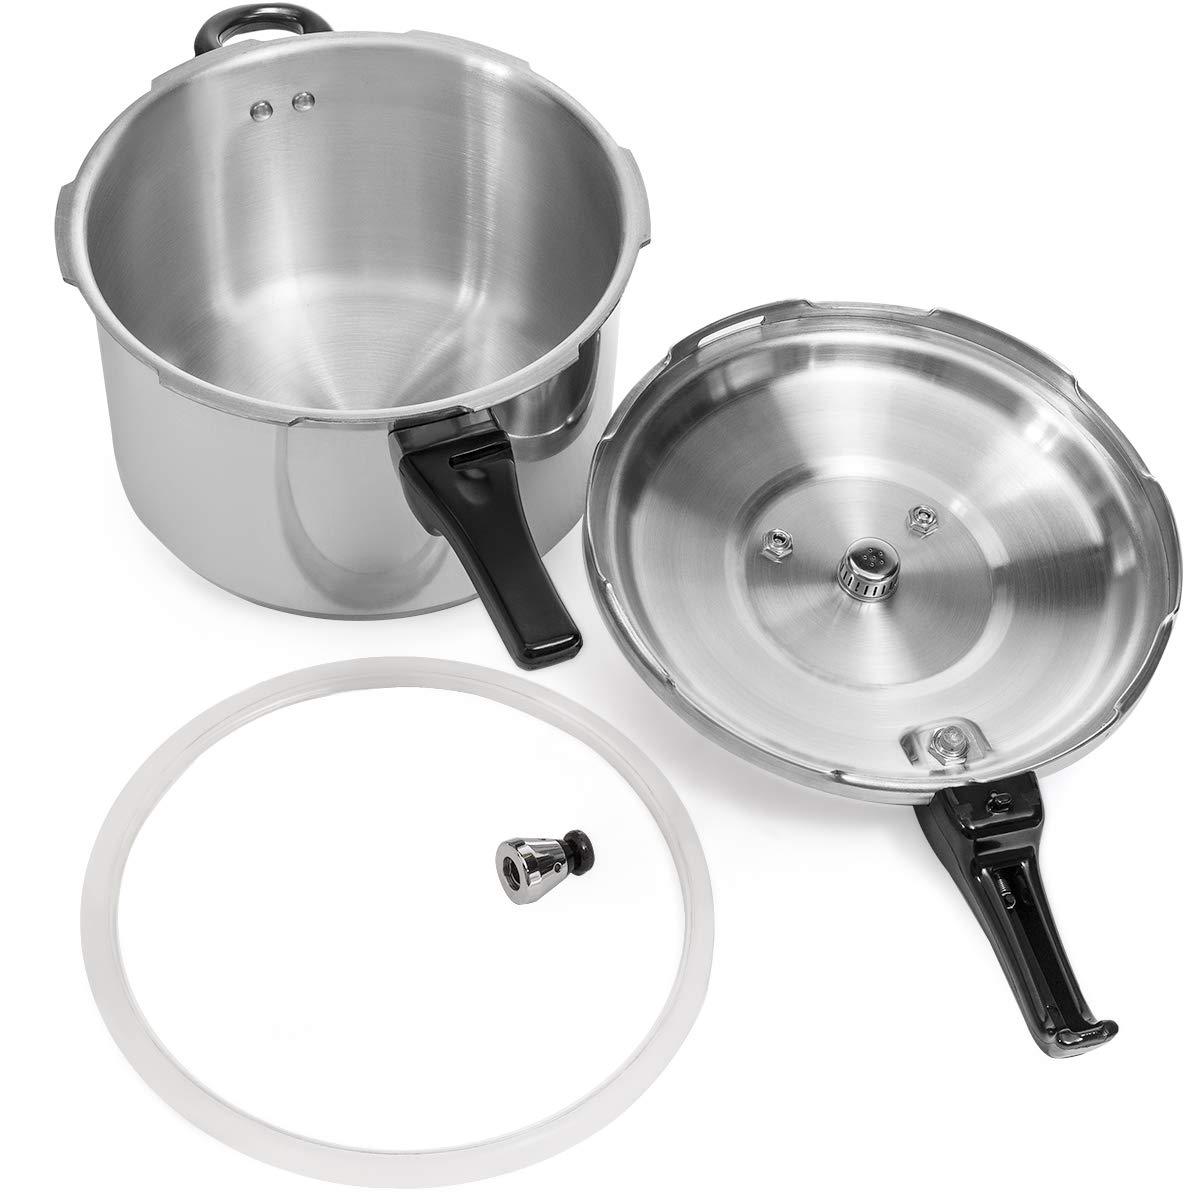 Barton 8-Quart Aluminum Pressure Cooker Stovetop Fast Cooker Pot Pressure Regulator Fast Cooking Steam Release Valve by Barton (Image #7)